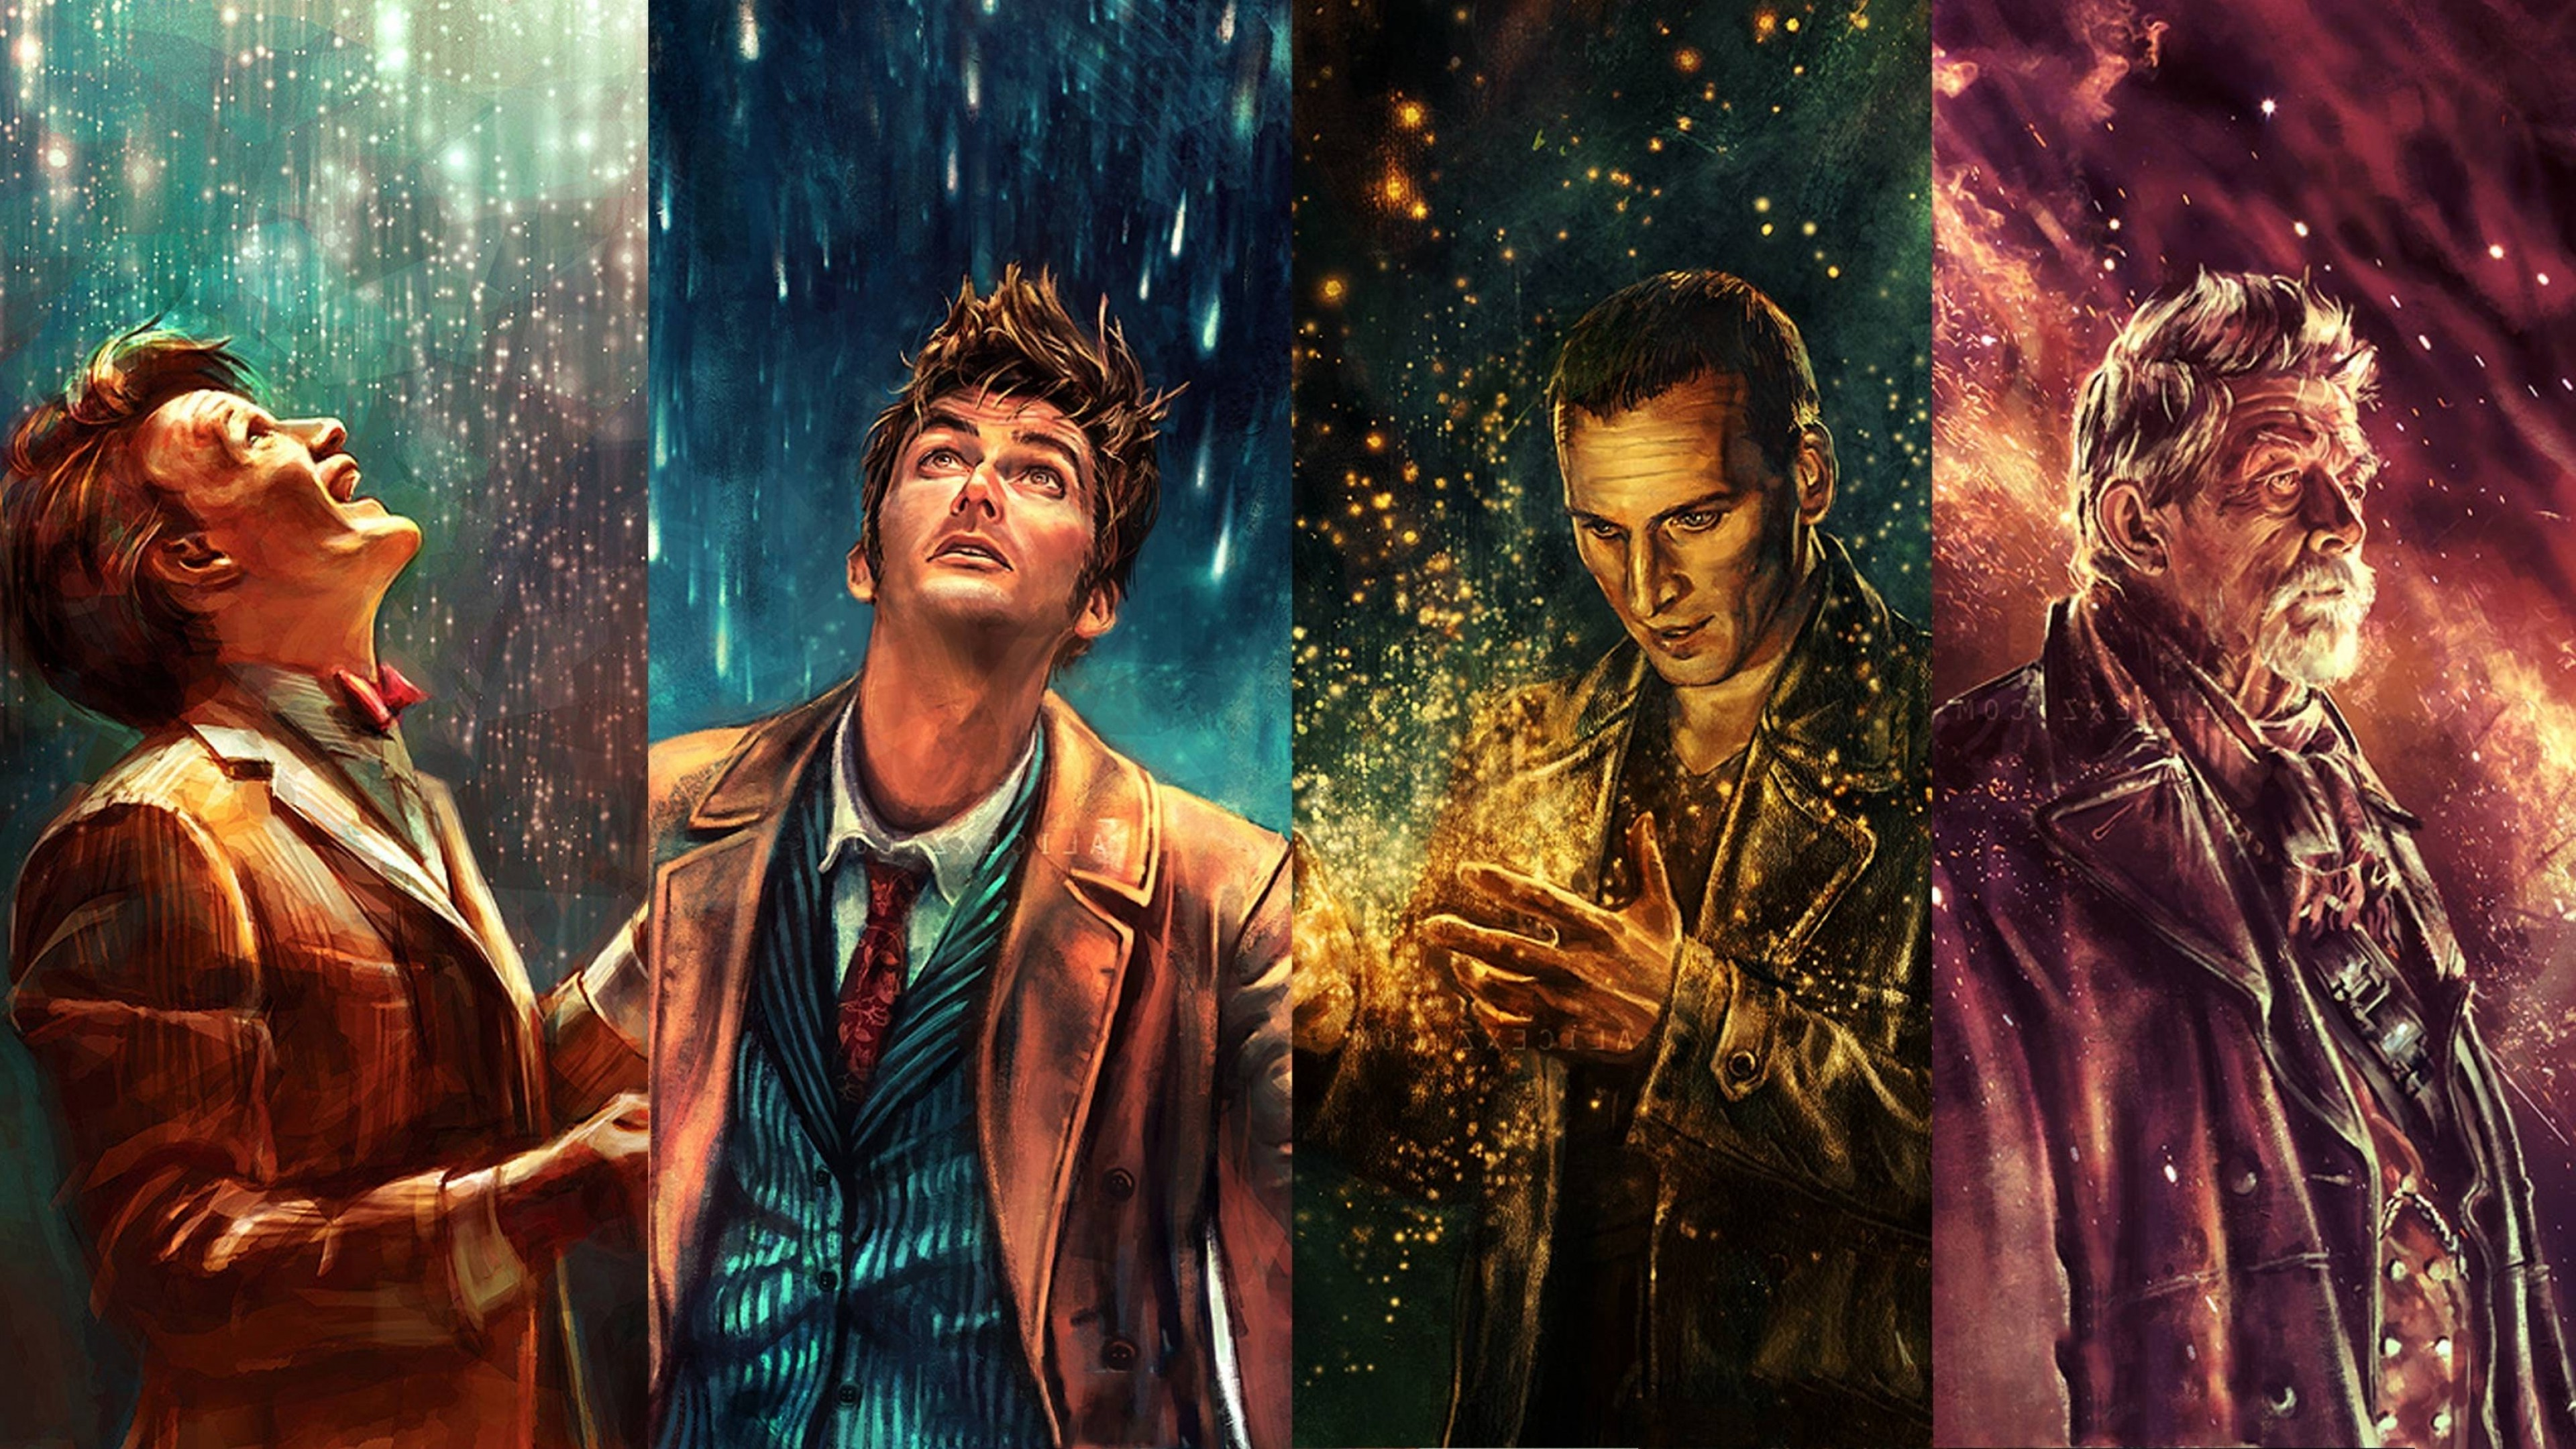 tenth doctor wallpaper 1920x1080